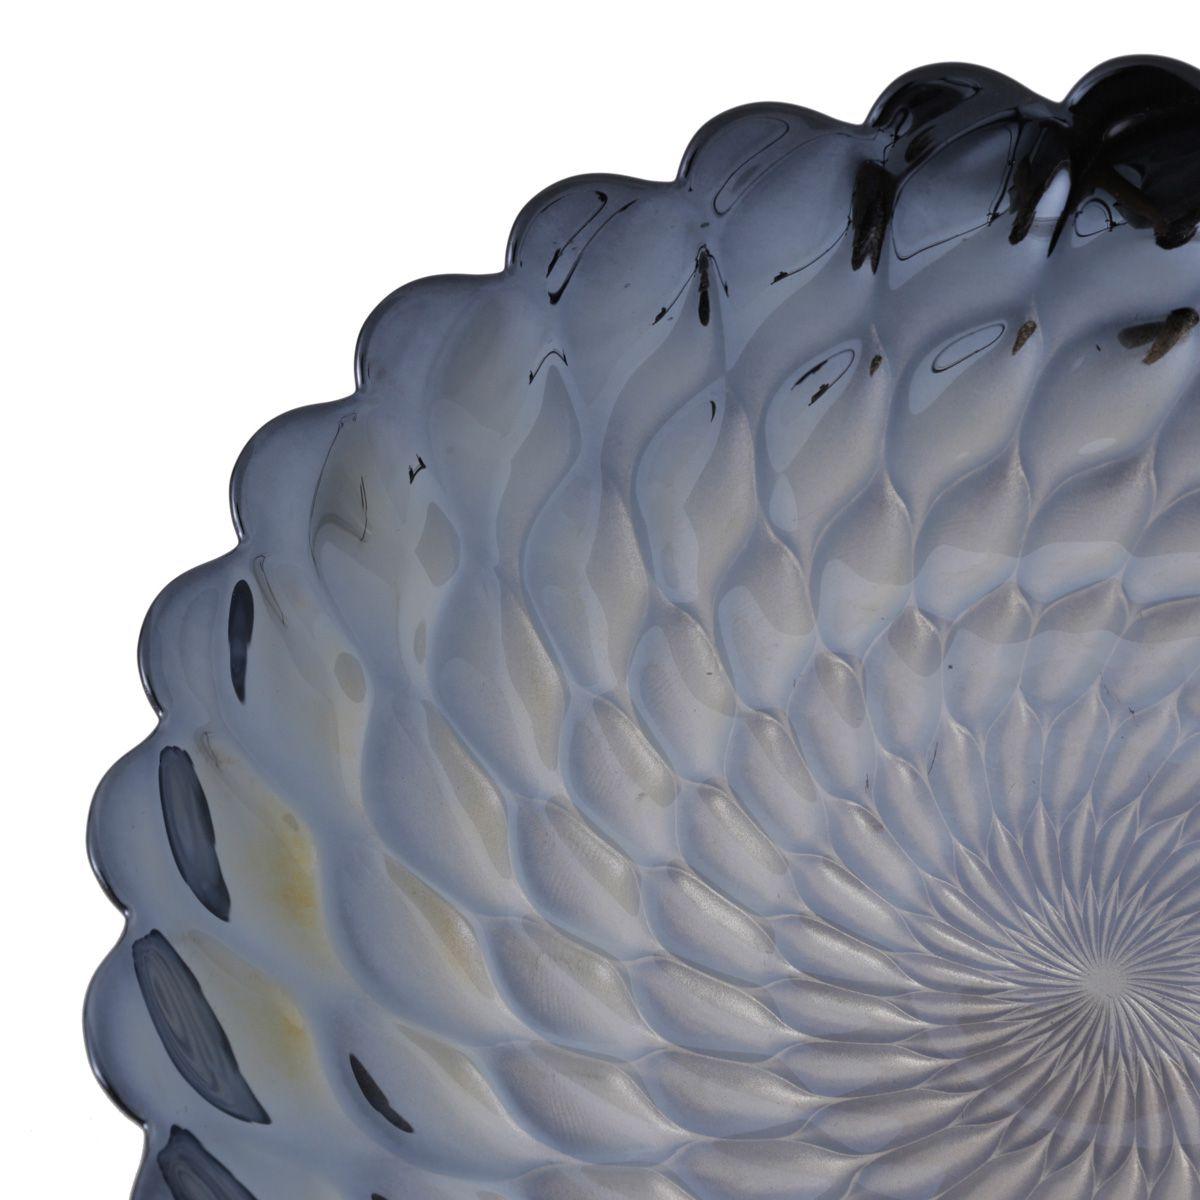 Centro De Mesa Decorativo De Vidro  Belgravia Iris Luster 40x7cm